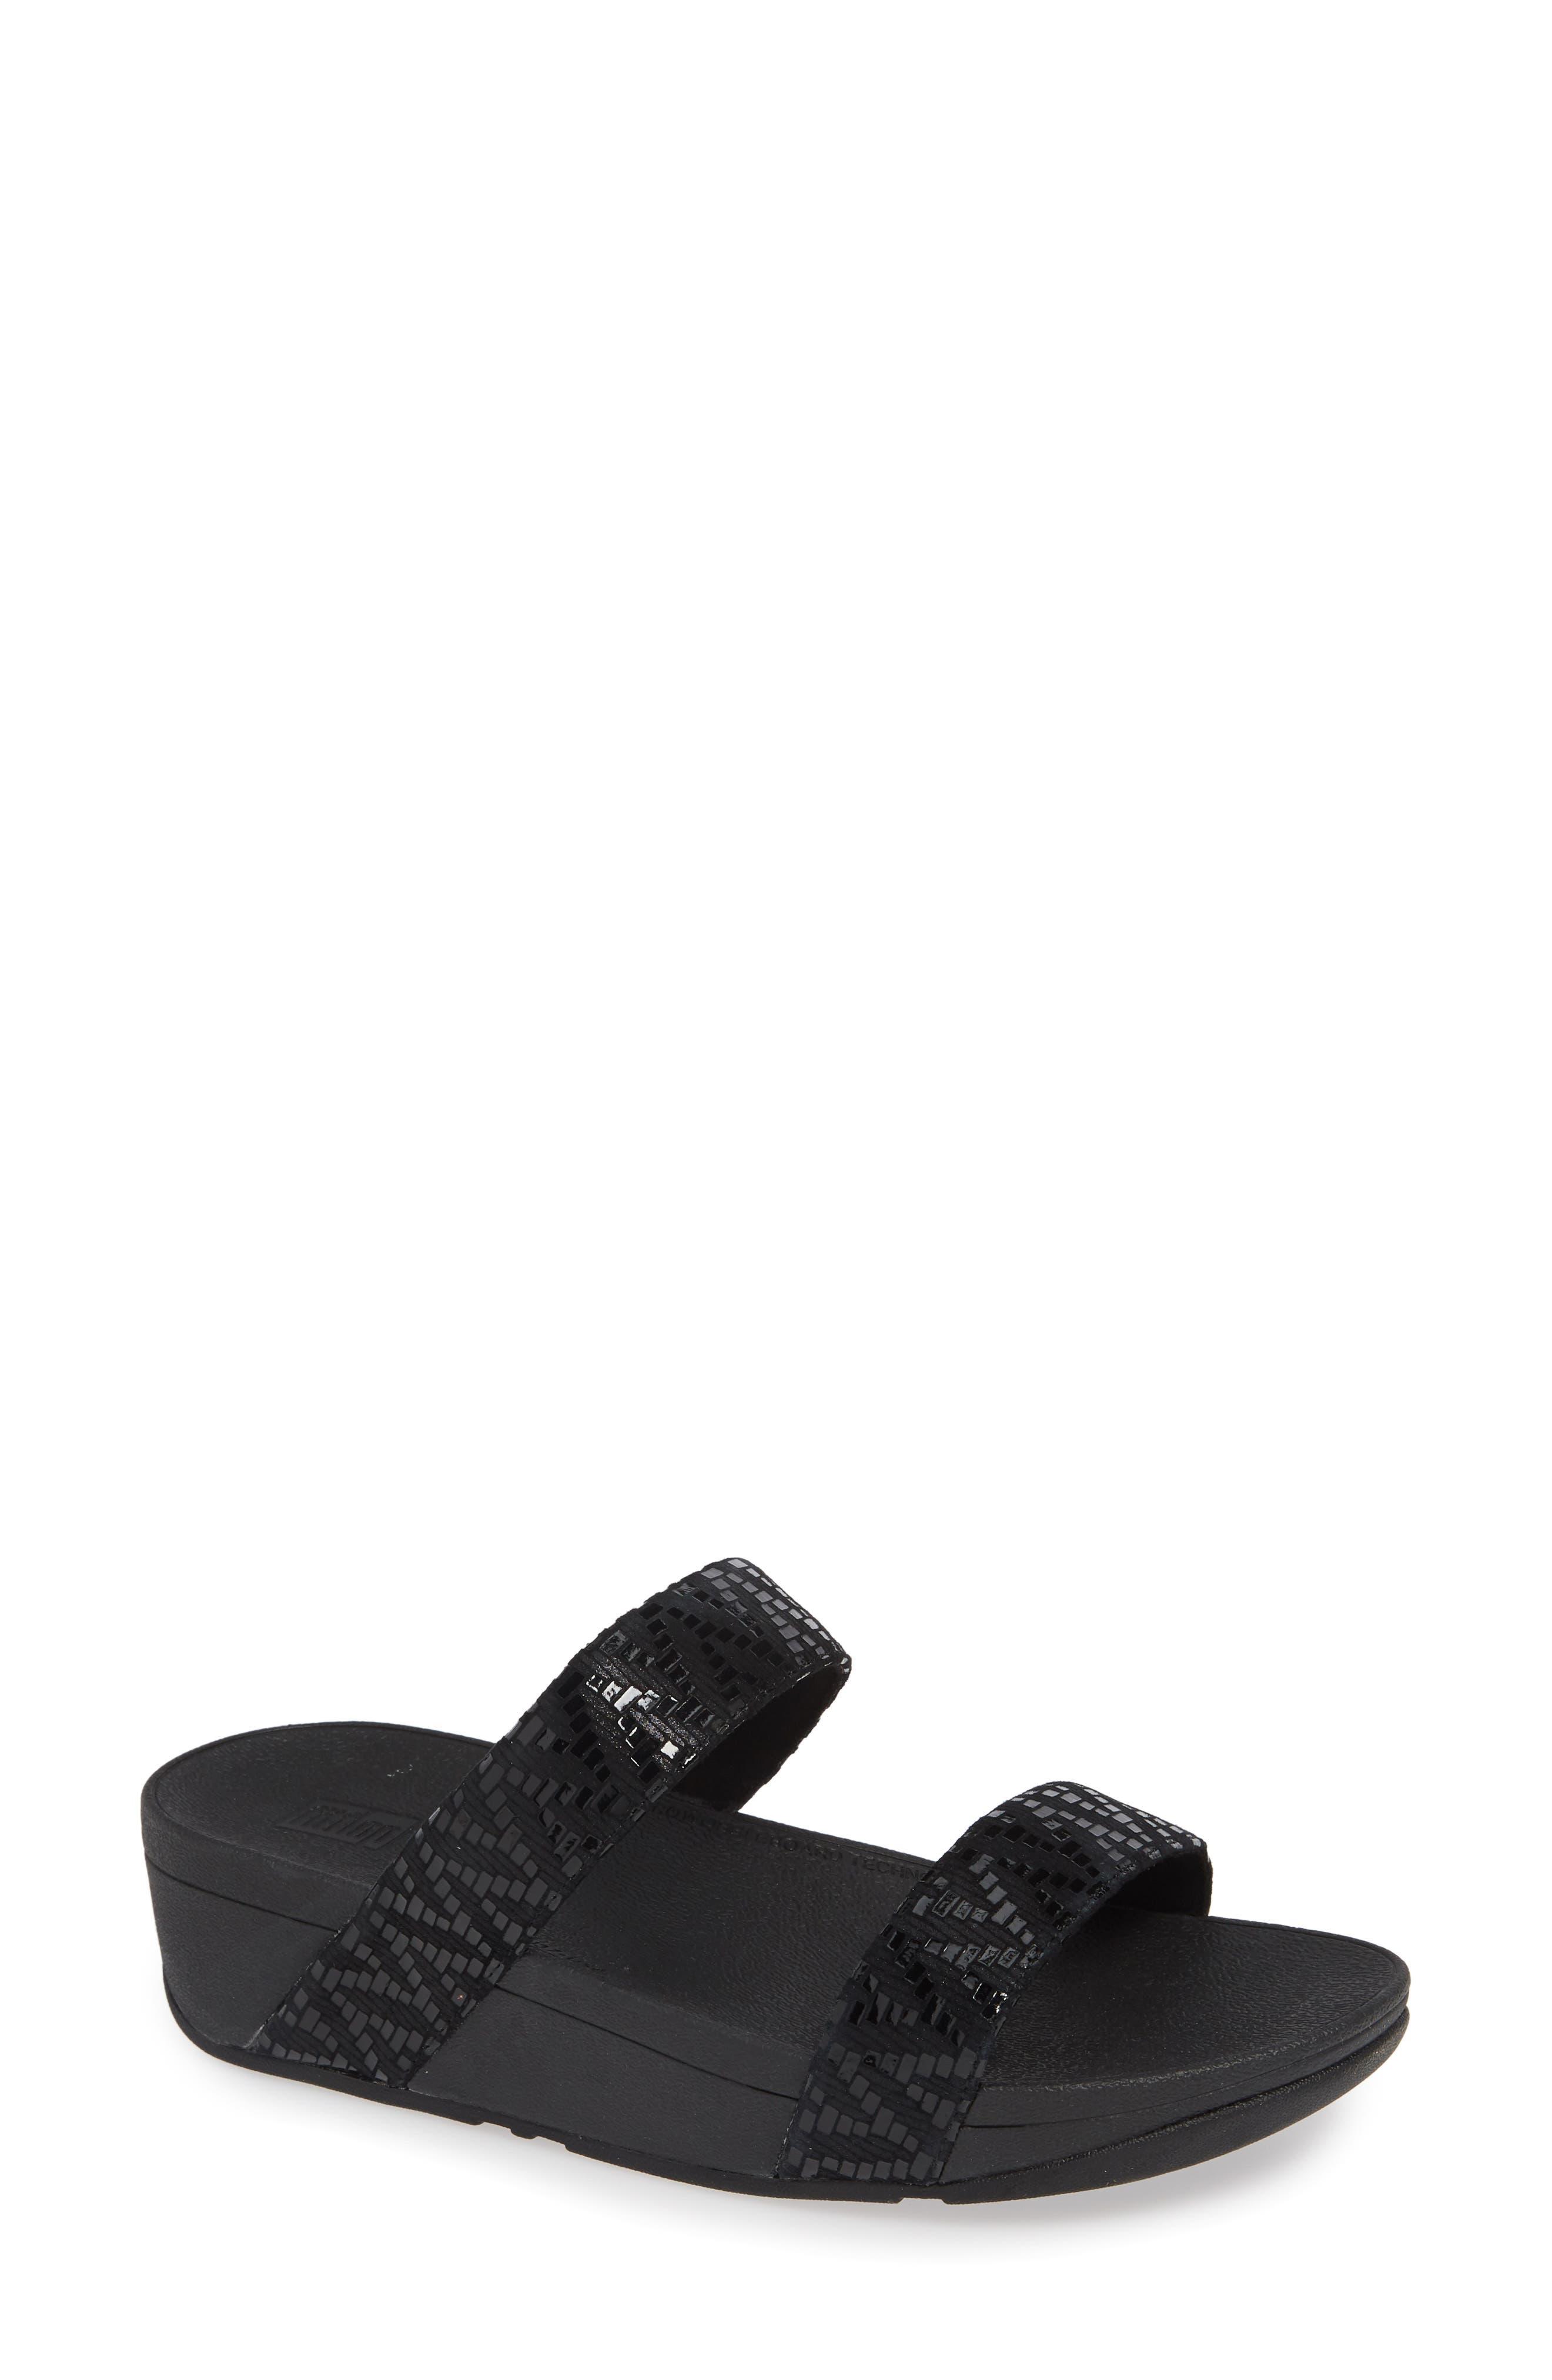 Lottie Chevron Wedge Slide Sandal, Main, color, BLACK FABRIC